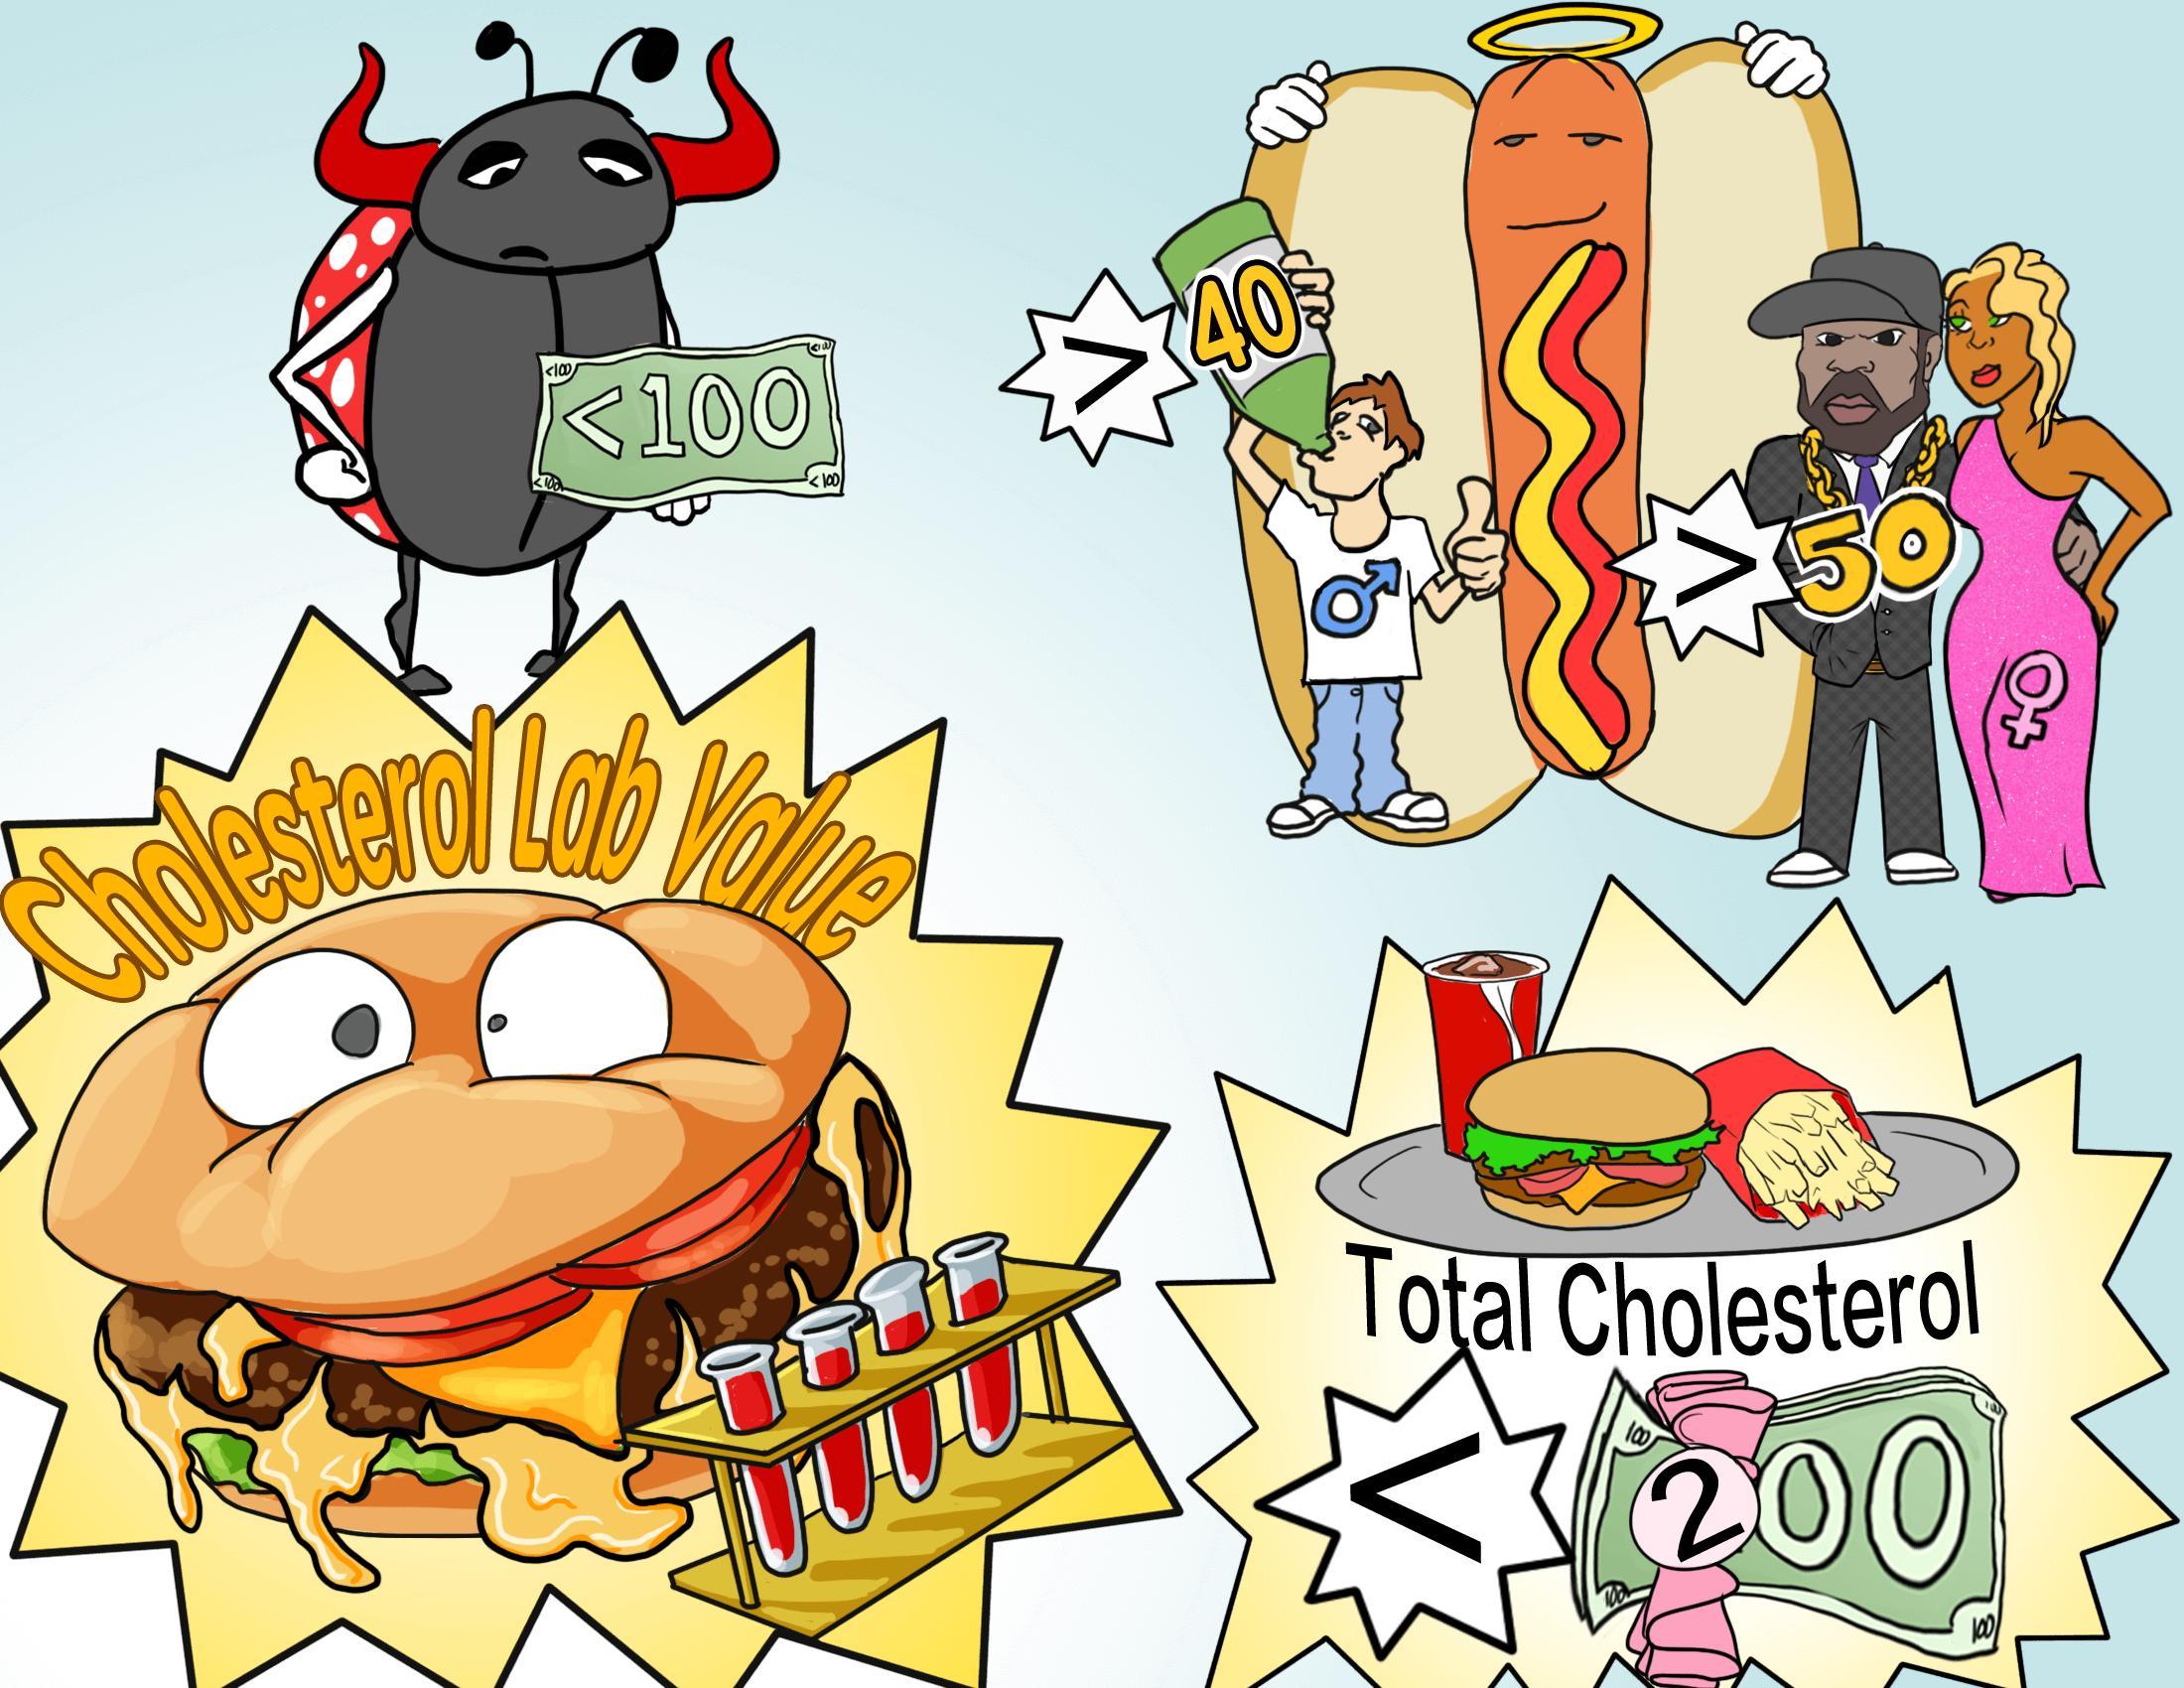 Cholesterol Lab Values